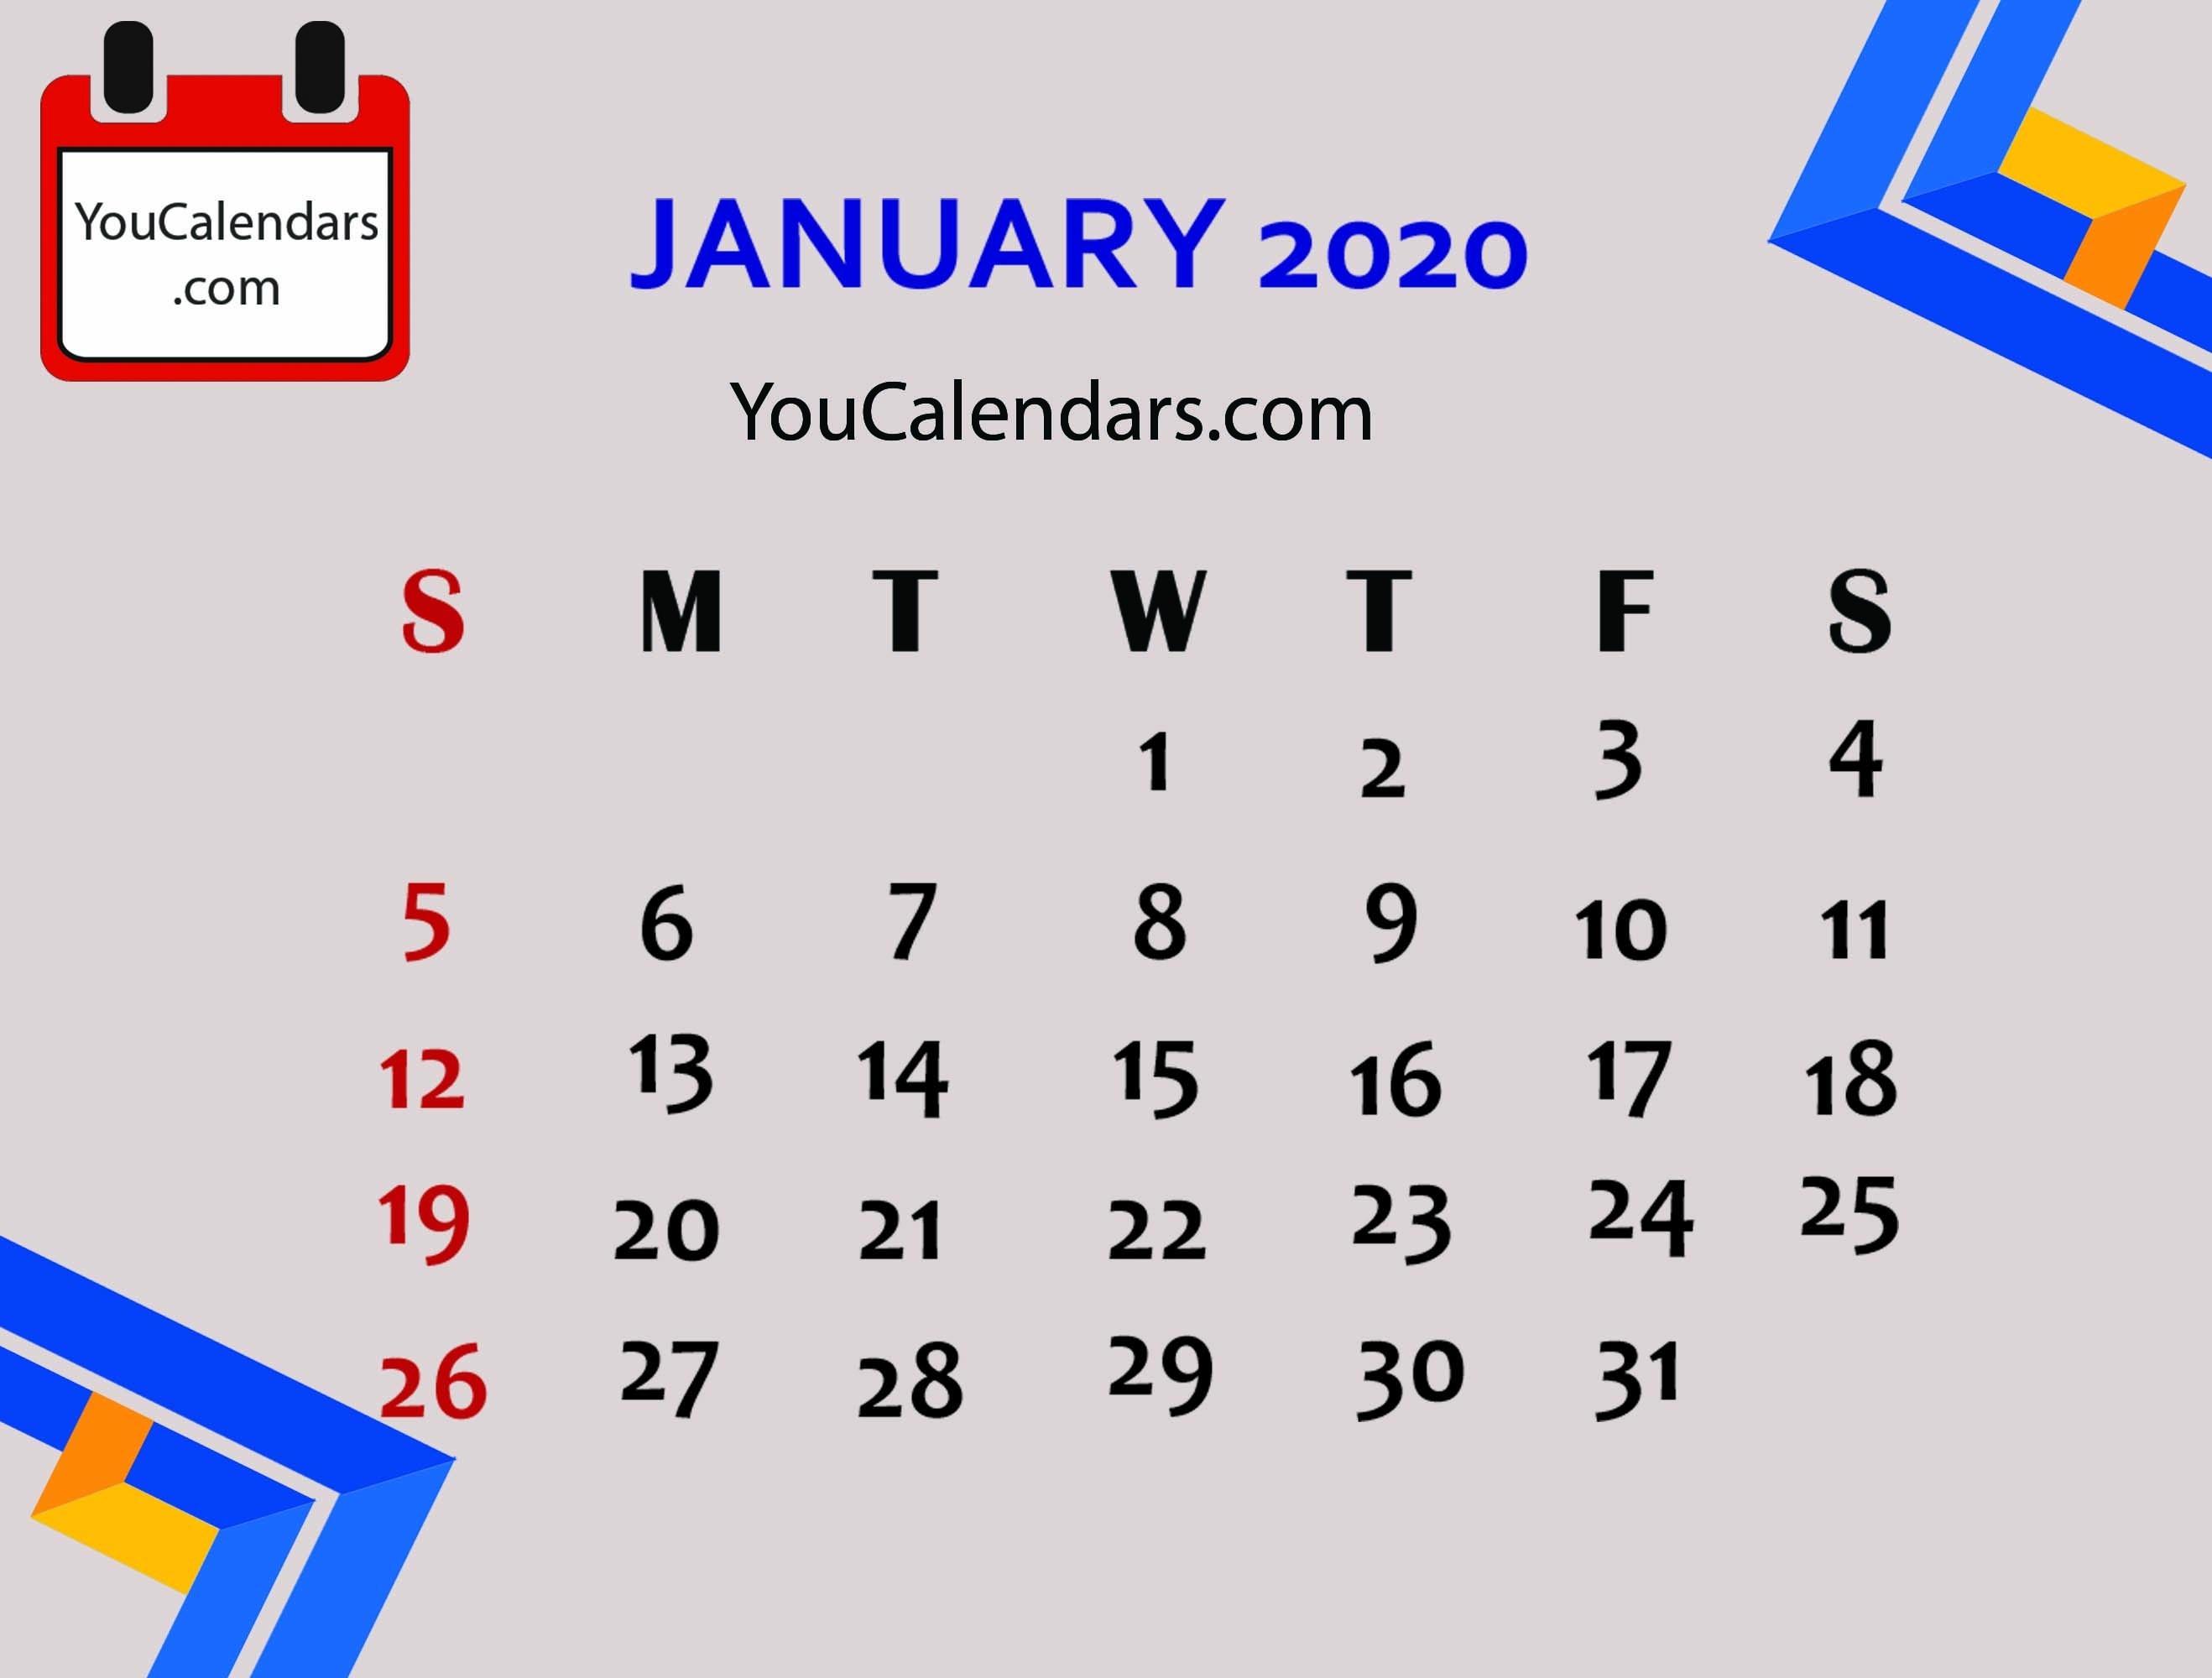 ✅Free January 2020 Calendar Printable Template - You Calendars-January 2020 Calendar Cute